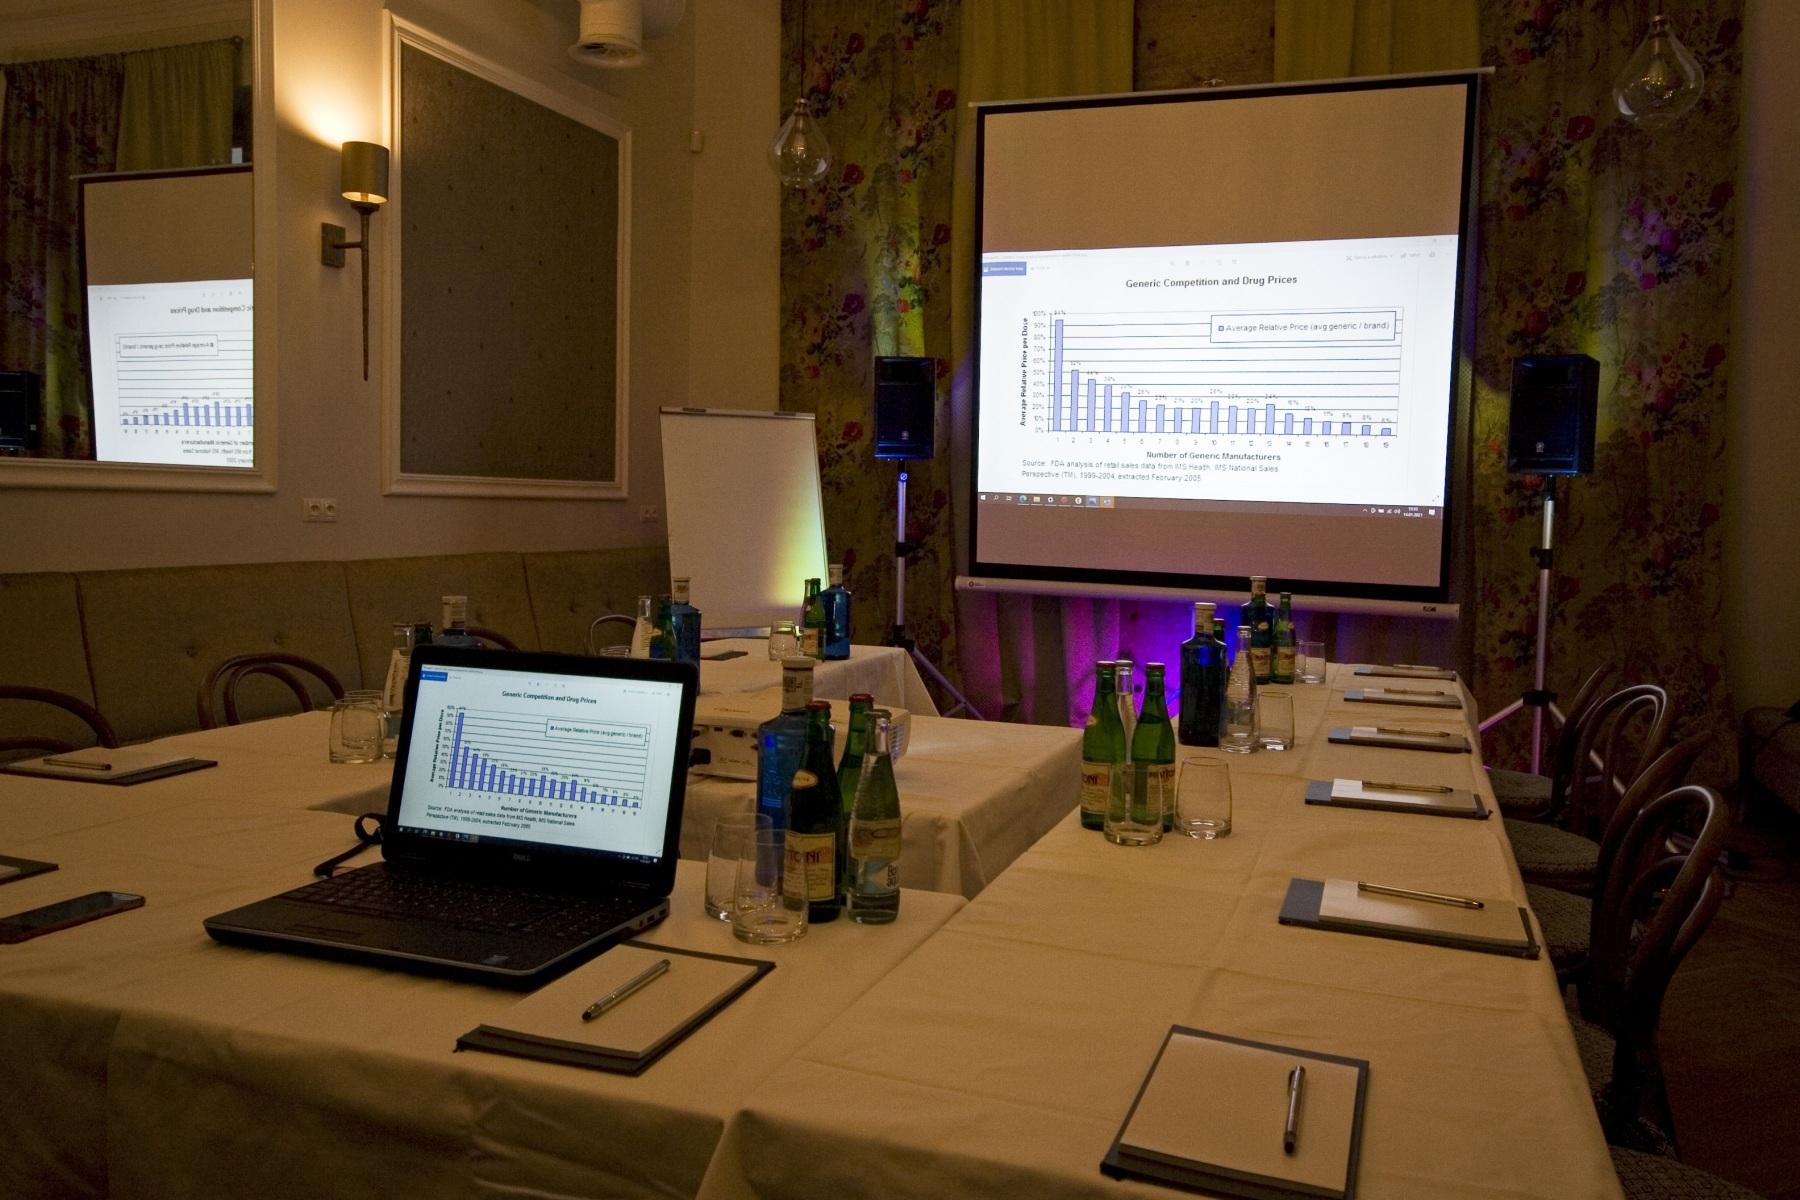 1_A-TechService-foto-sluzby-konference-cafe-Graff-5